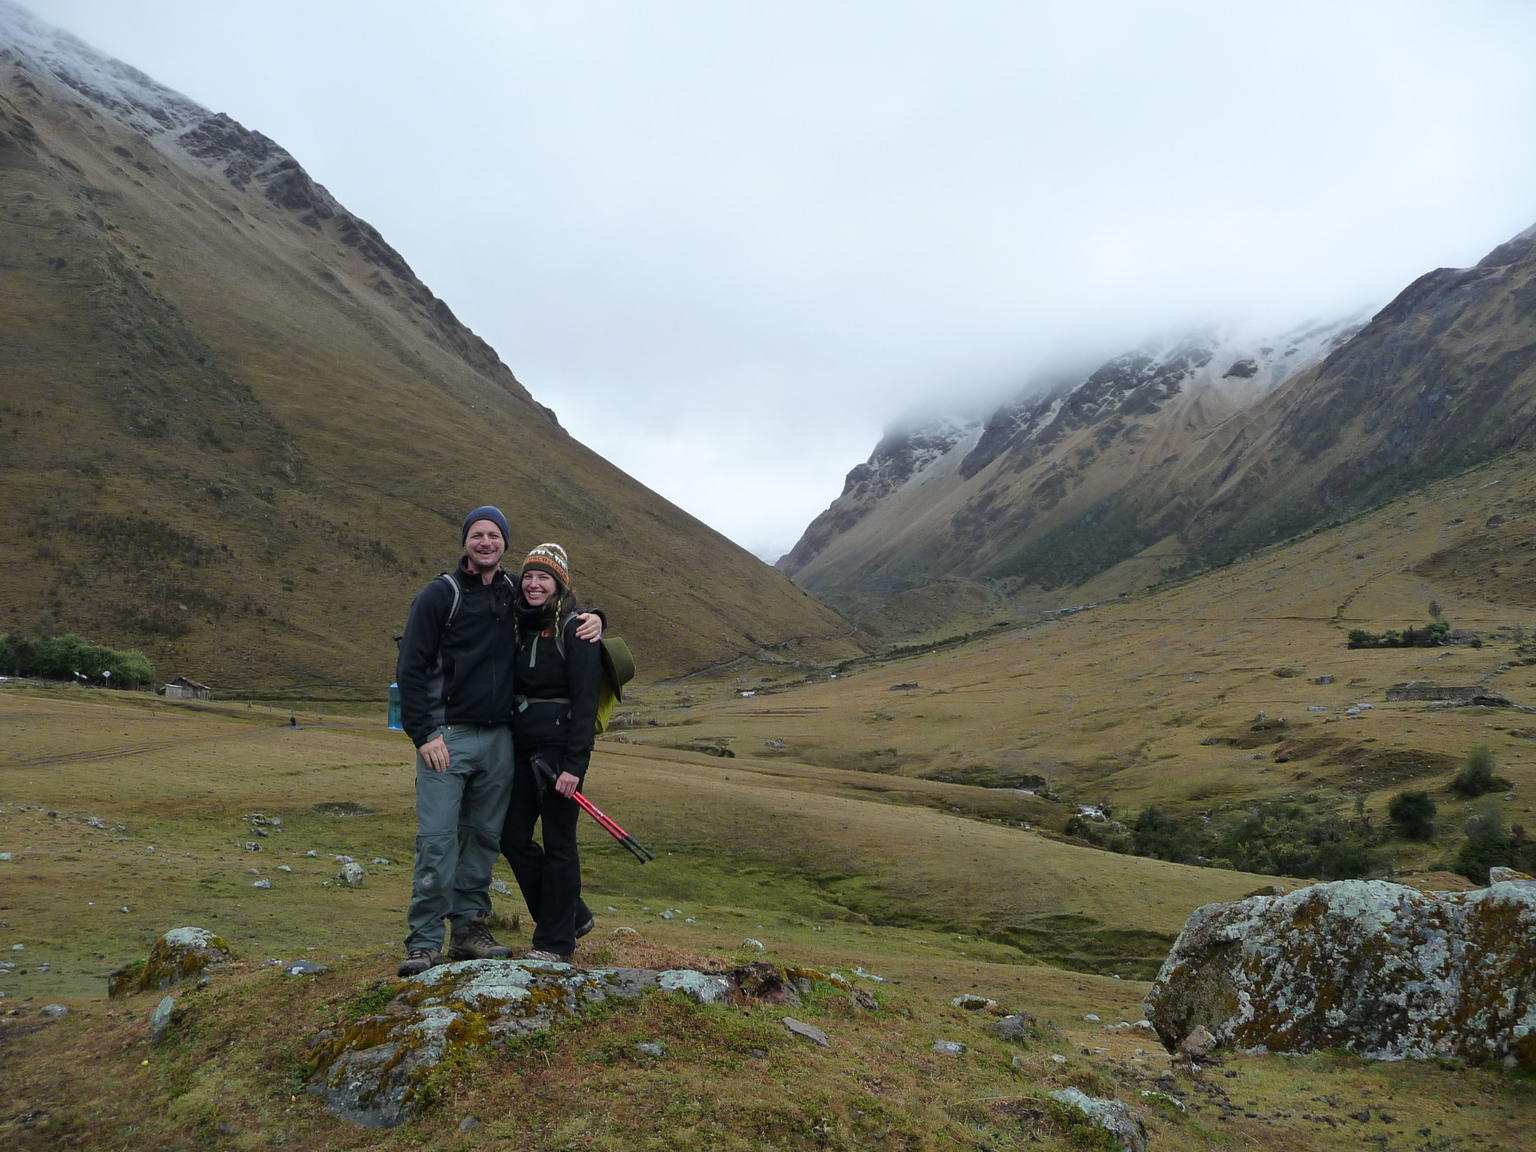 MAIS FOTOS, 5-Day Salkantay Trek and Machu Picchu Tour from Cusco